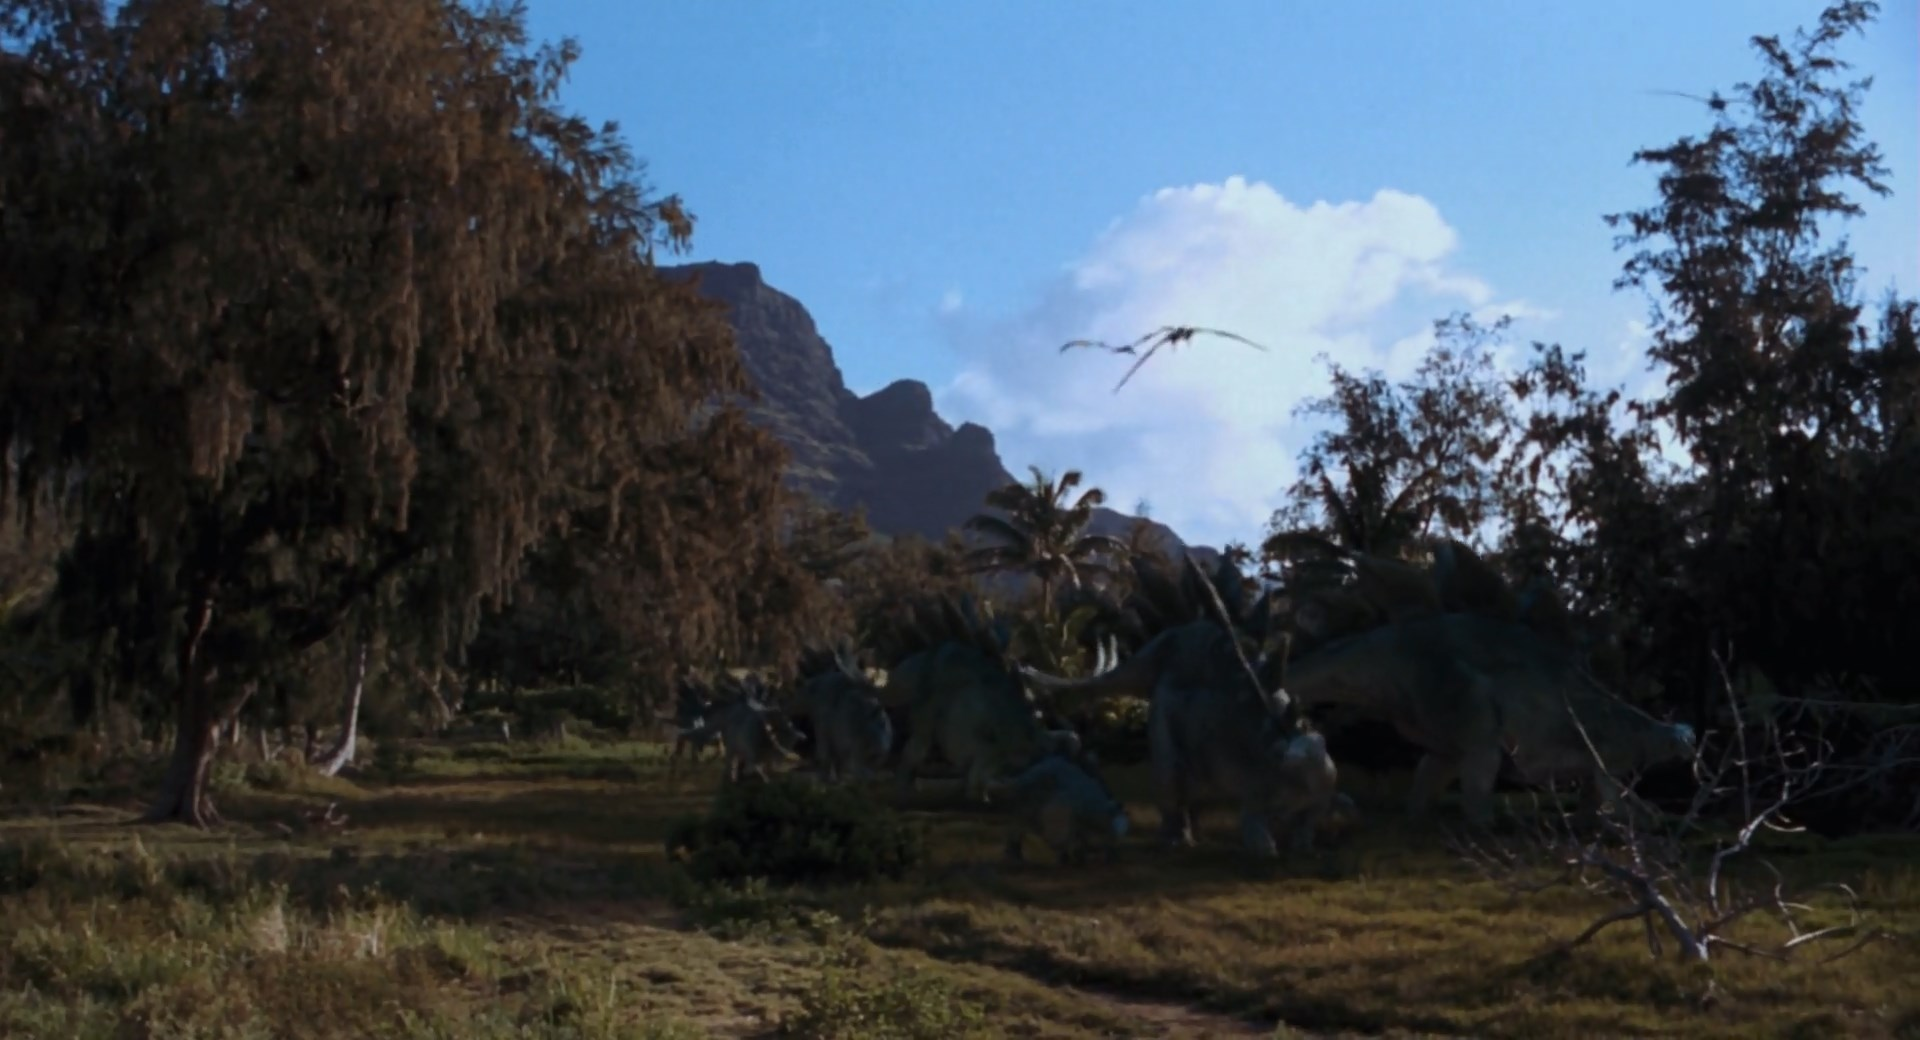 Stegosaurus The Lost World Jurassic Park 3 Jurassic World